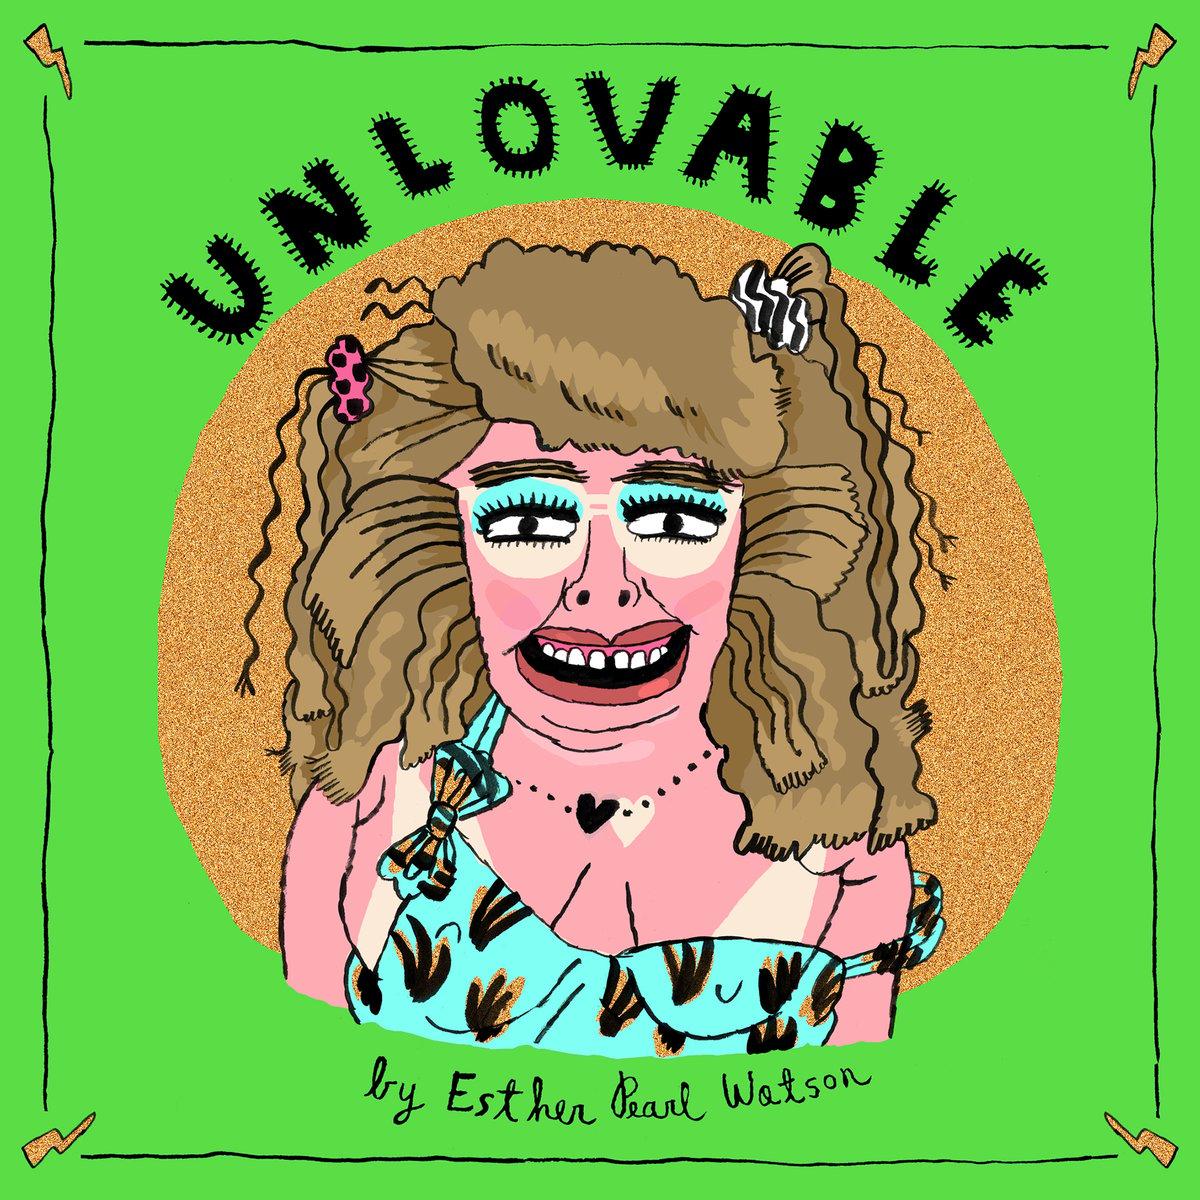 (Esther Pearl Watson) Unlovable Vol. 3